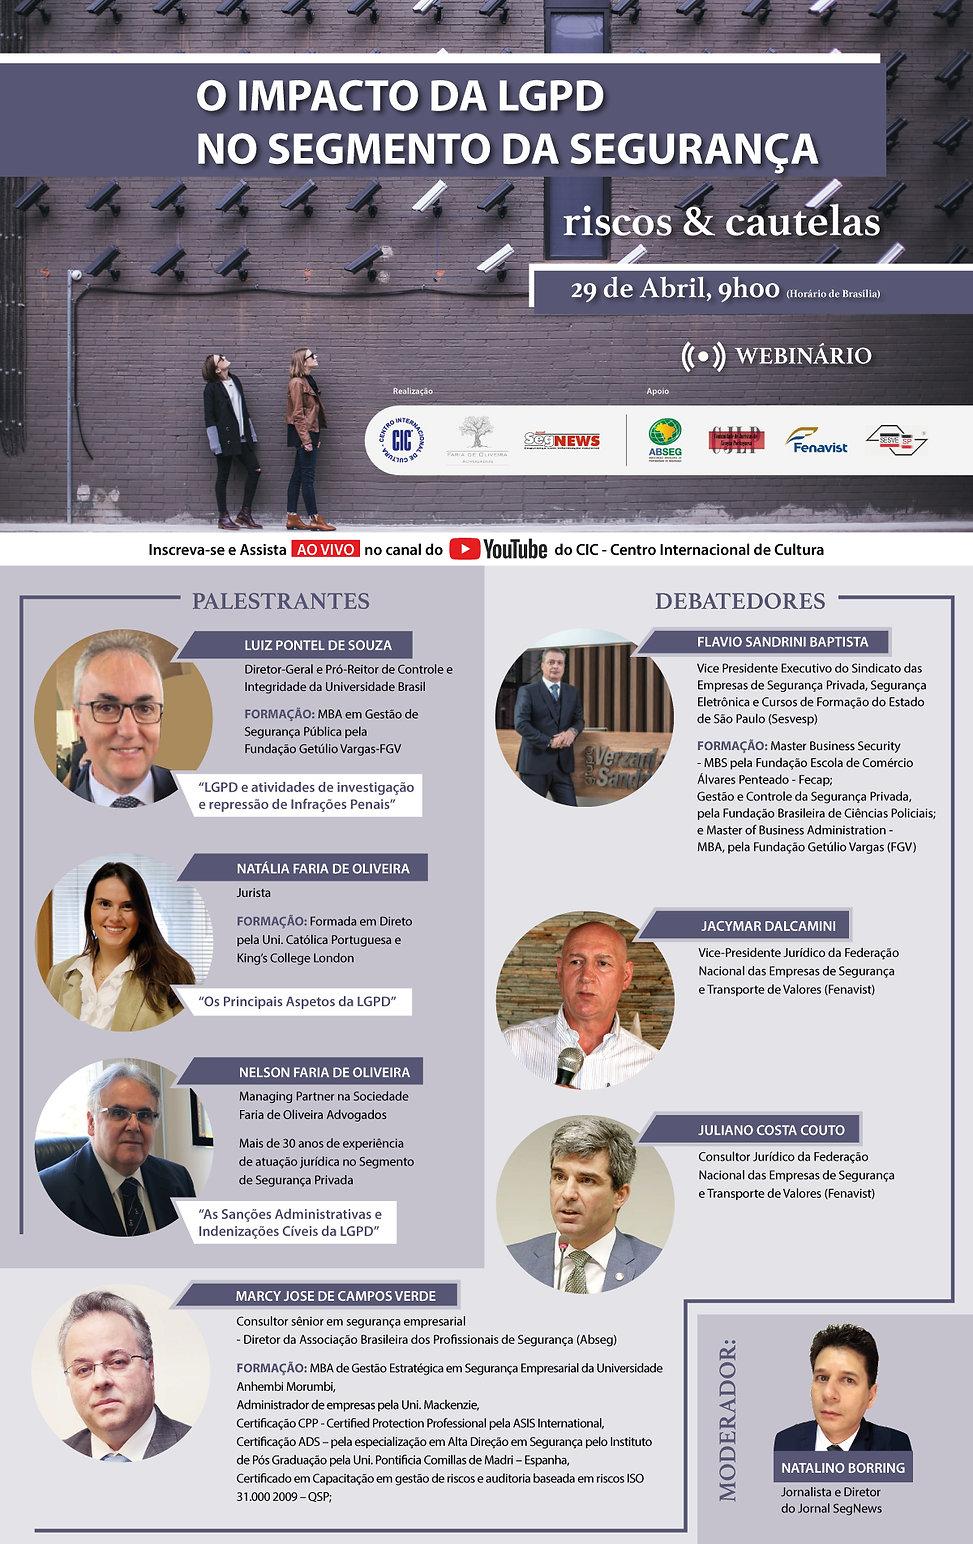 LGPD_Seguranca-cartaz_palestrantes_e_deb